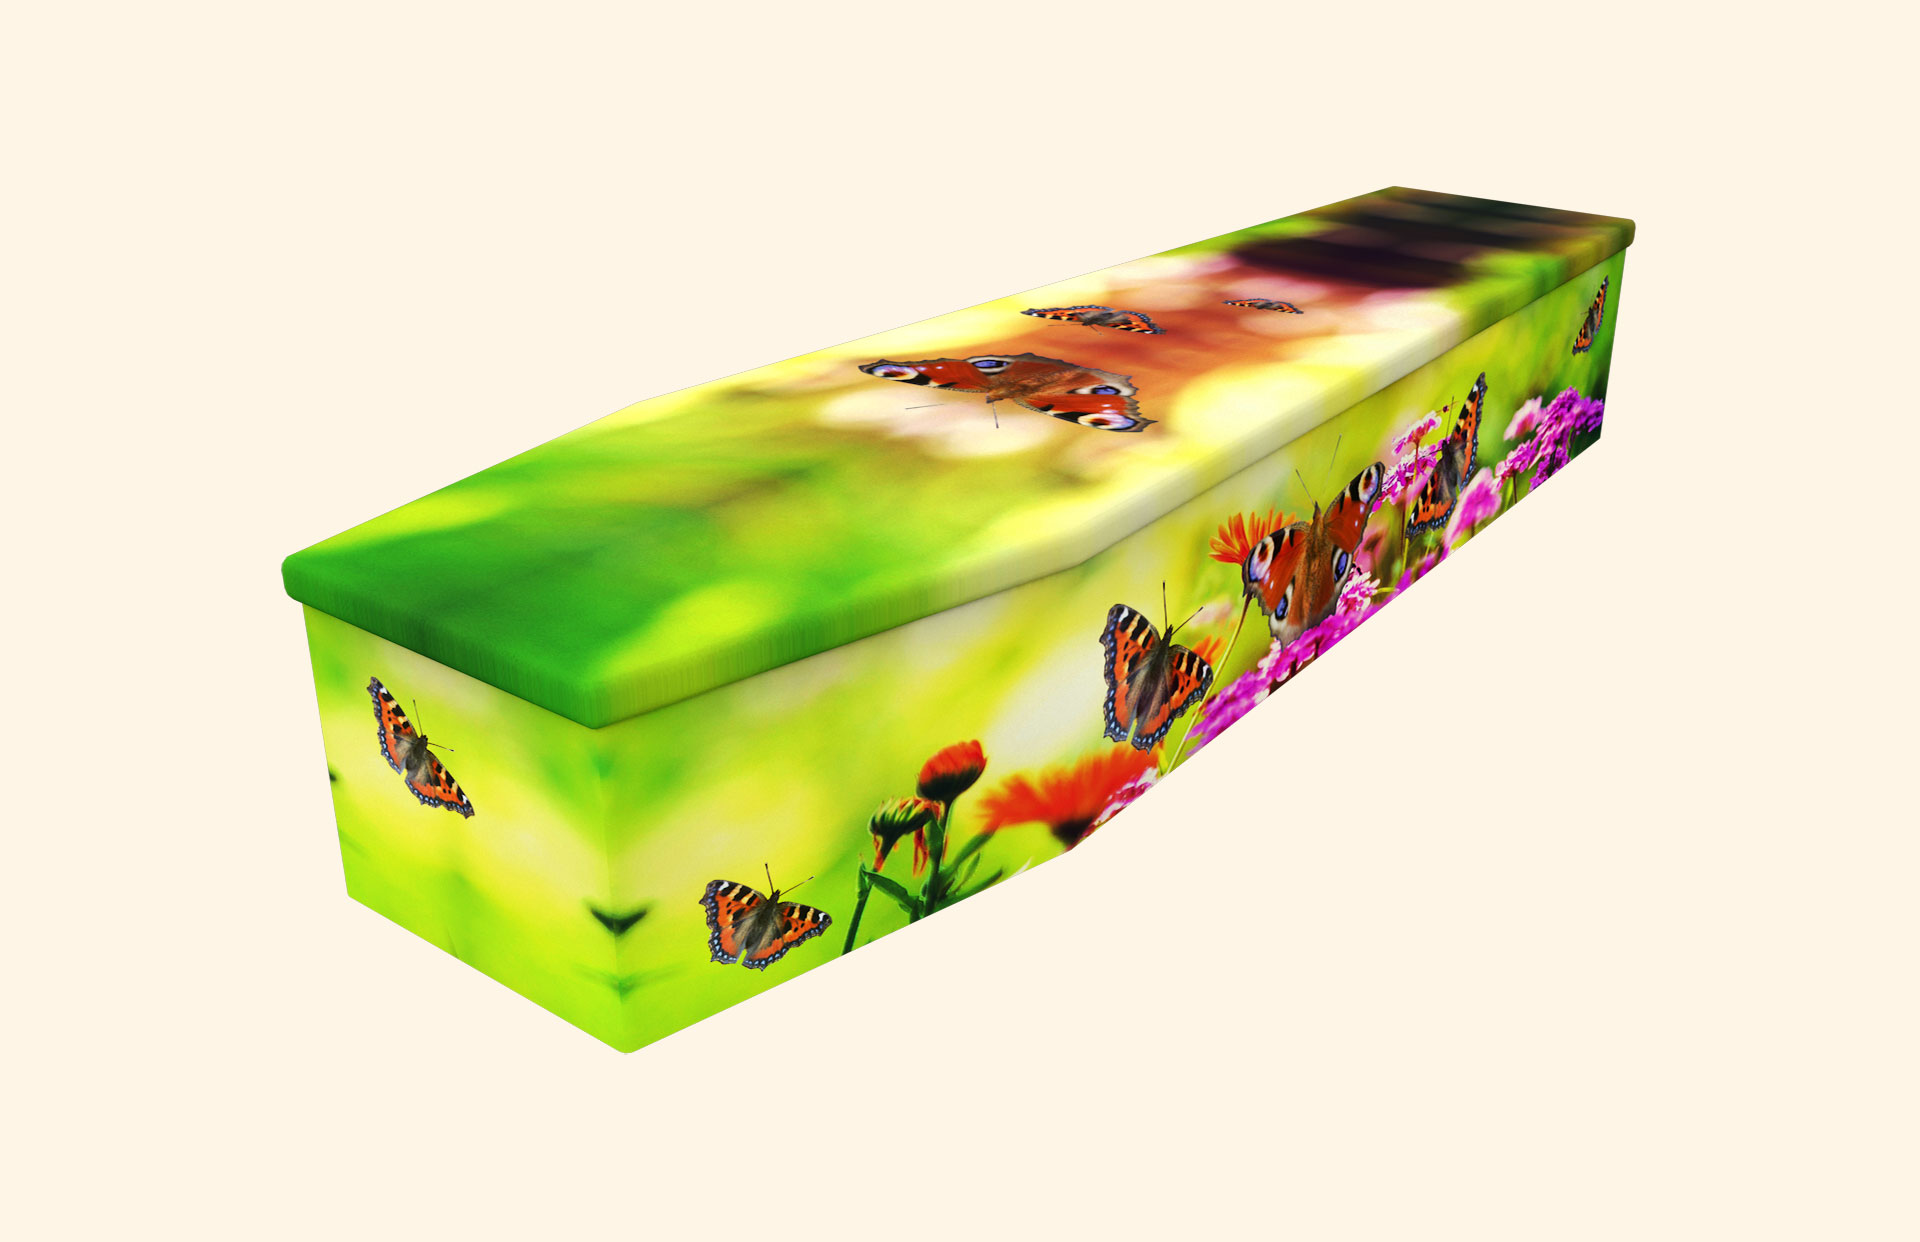 Dancing Butterflies in a cardboard coffin